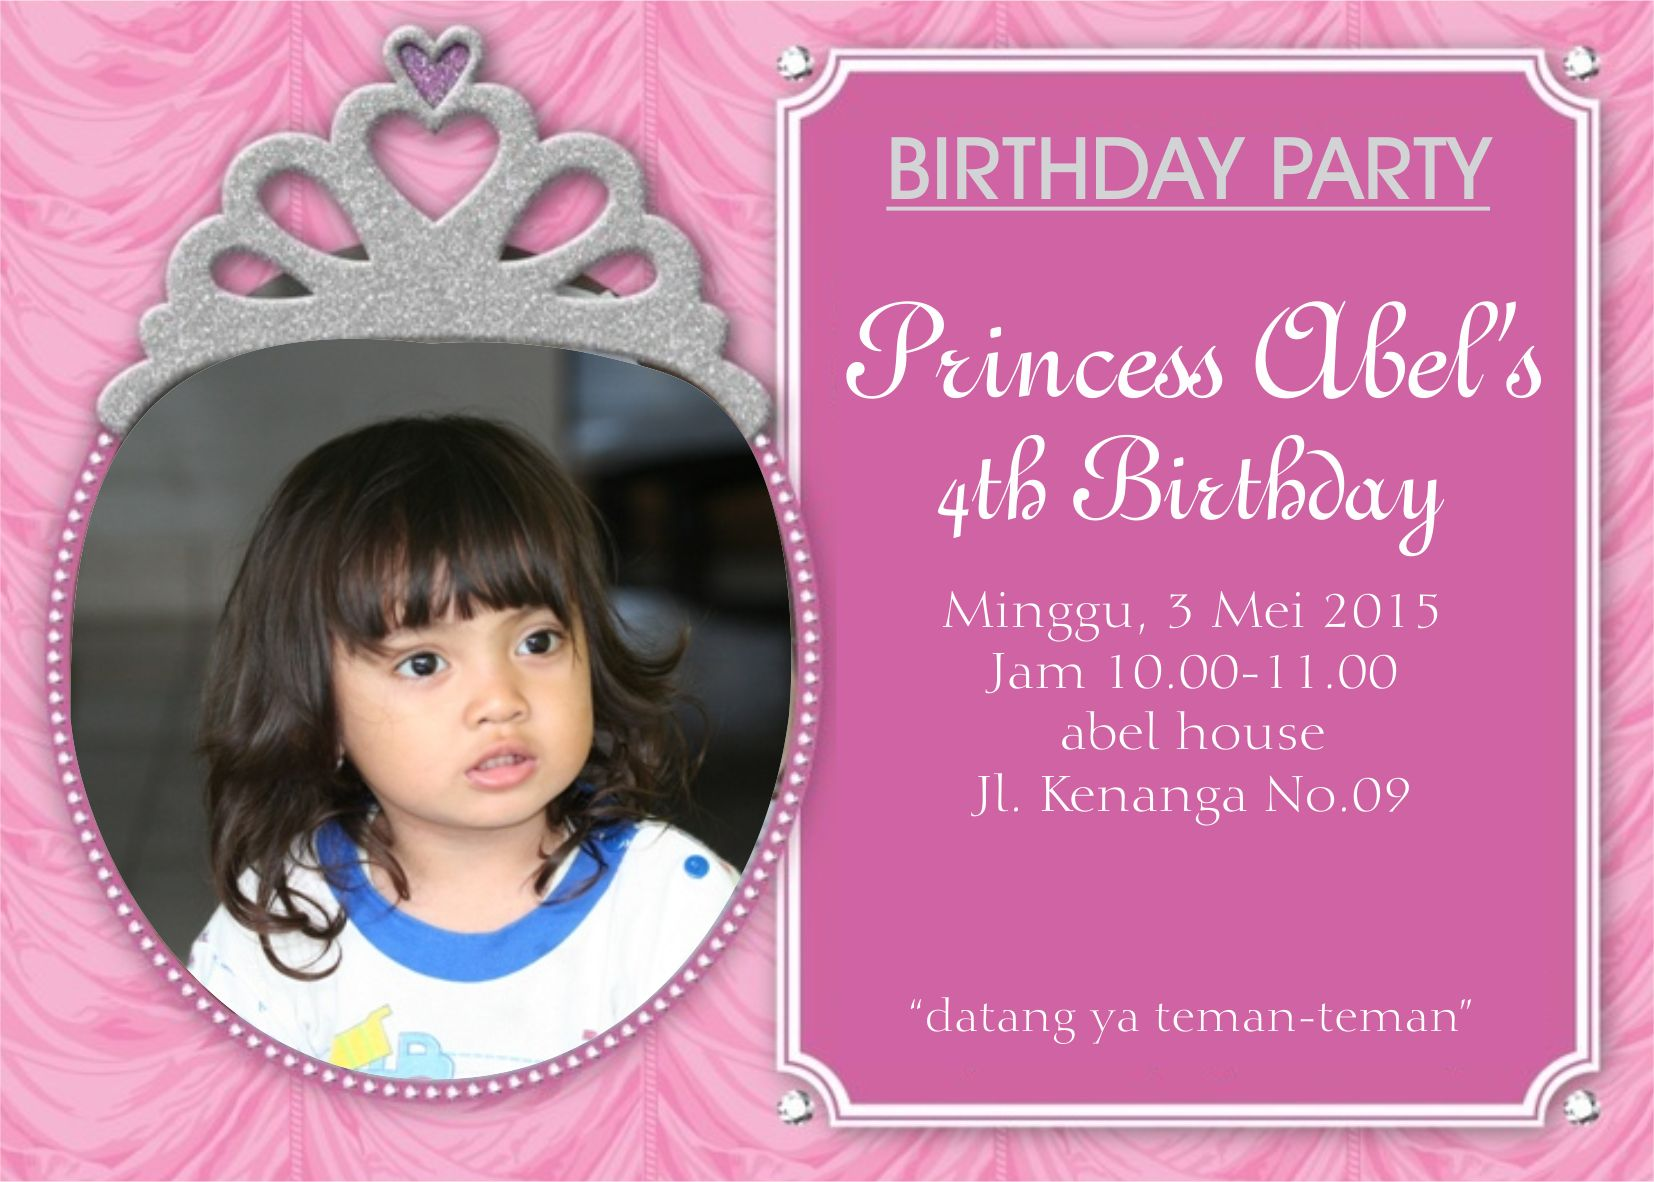 Undangan Ulang Tahun Anak Princess Kartu Undangan Ulang Tahun Anak